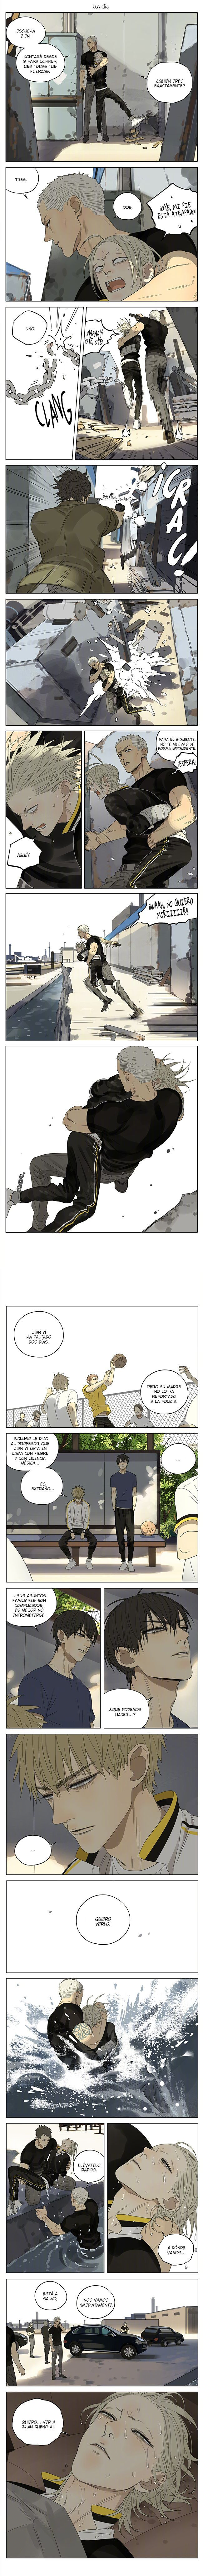 19 Days Capítulo 195 página 2 - Leer Manga en Español gratis en NineManga.com